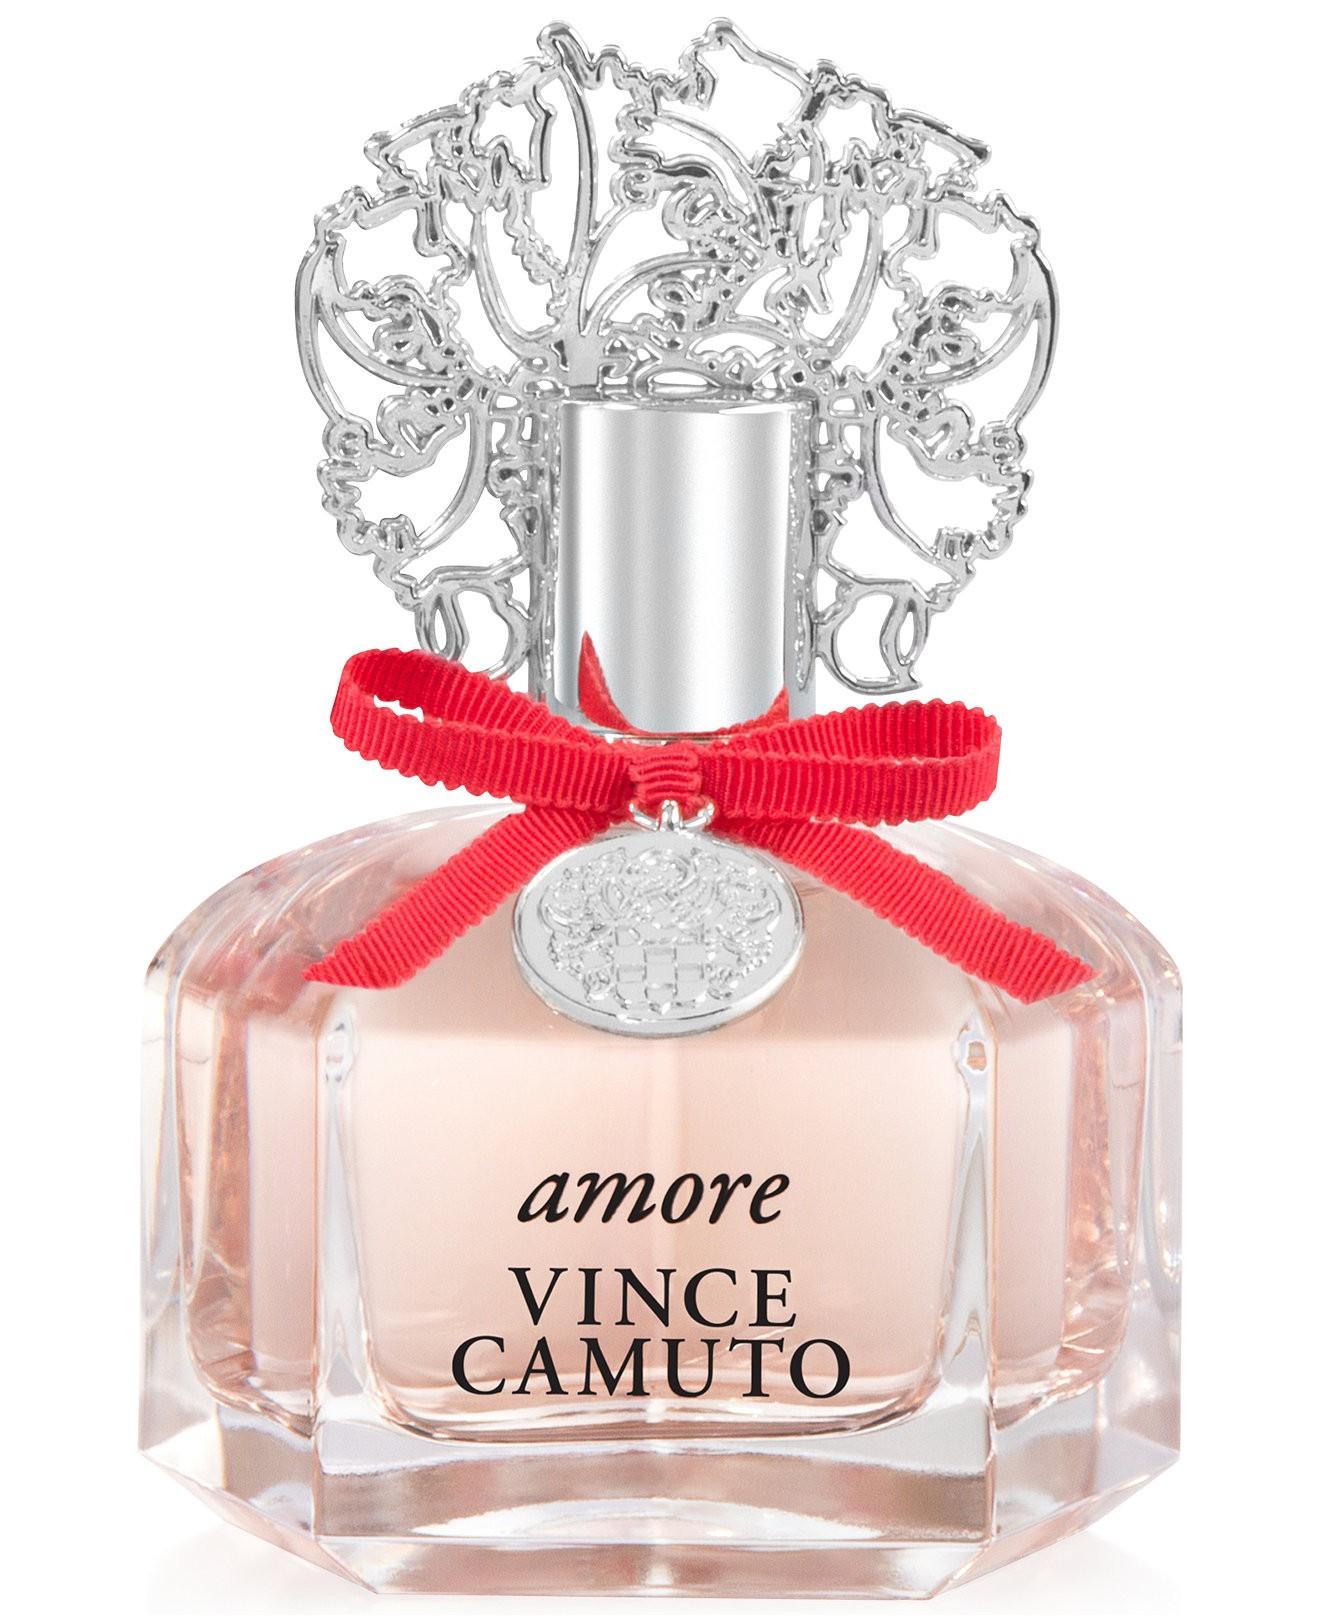 Vince Camuto Amore аромат для женщин